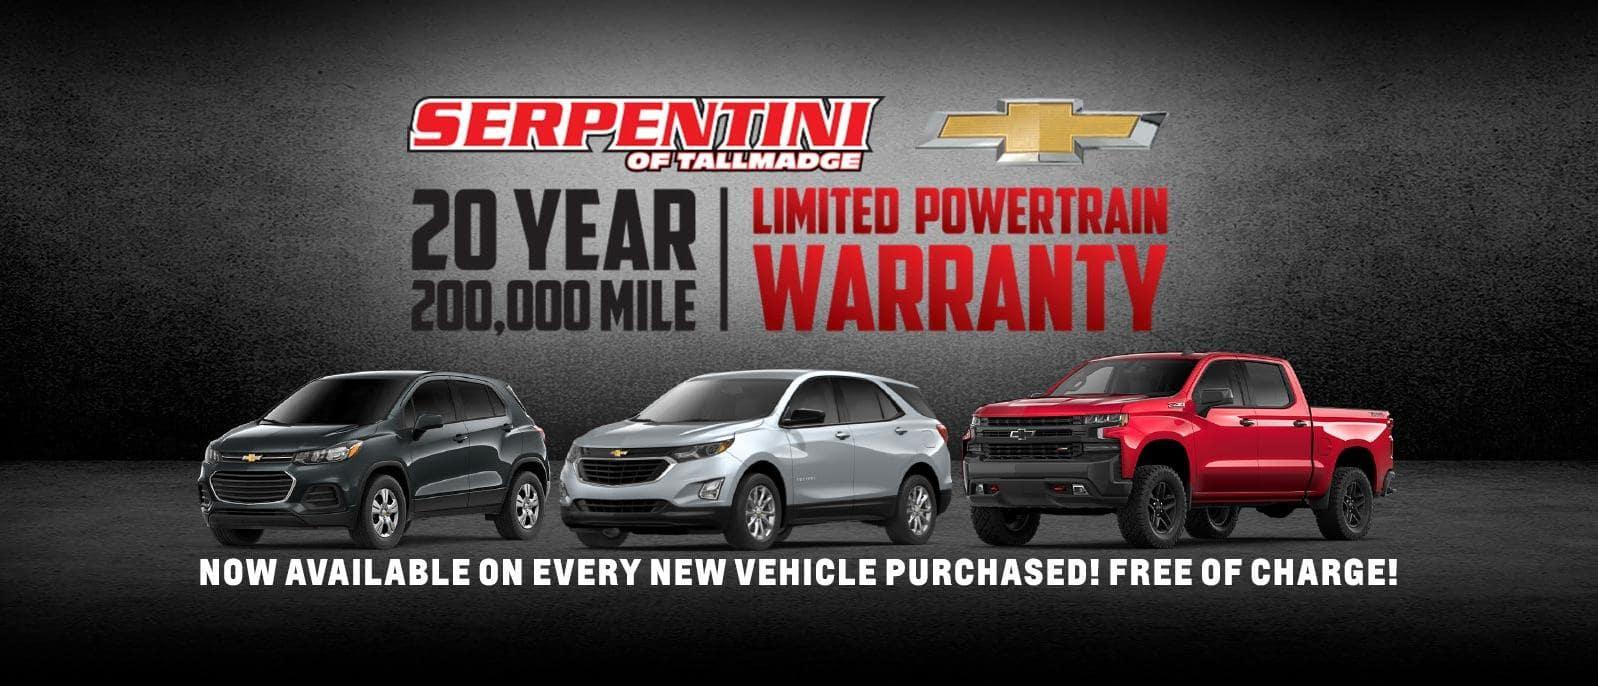 Serpentini 20 Year 200 000 Mile Warranty Serpentini Chevrolet Tallmadge